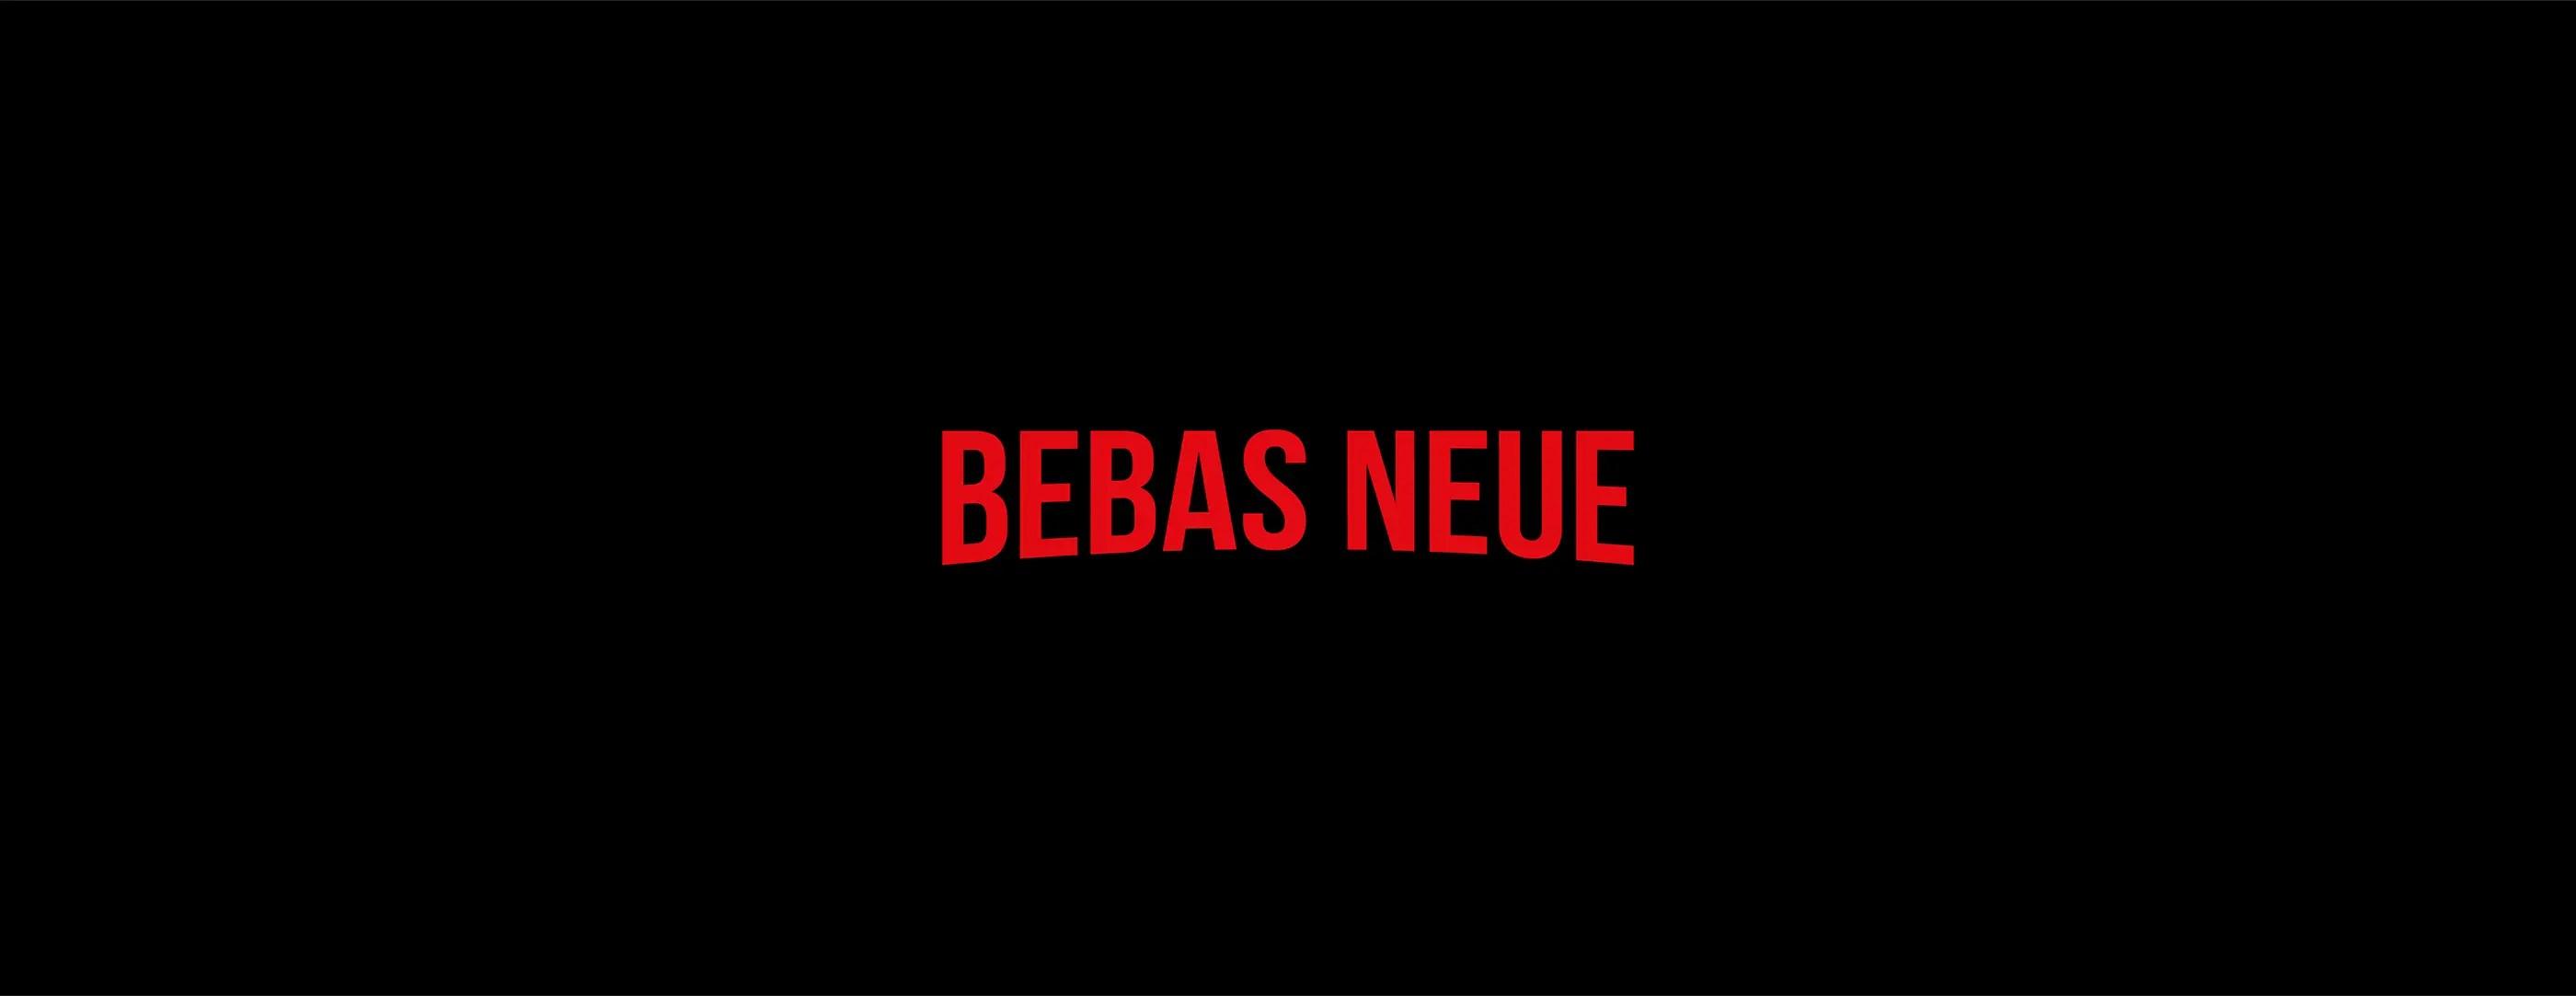 wersm-logo-font-netflix-bebas-neue